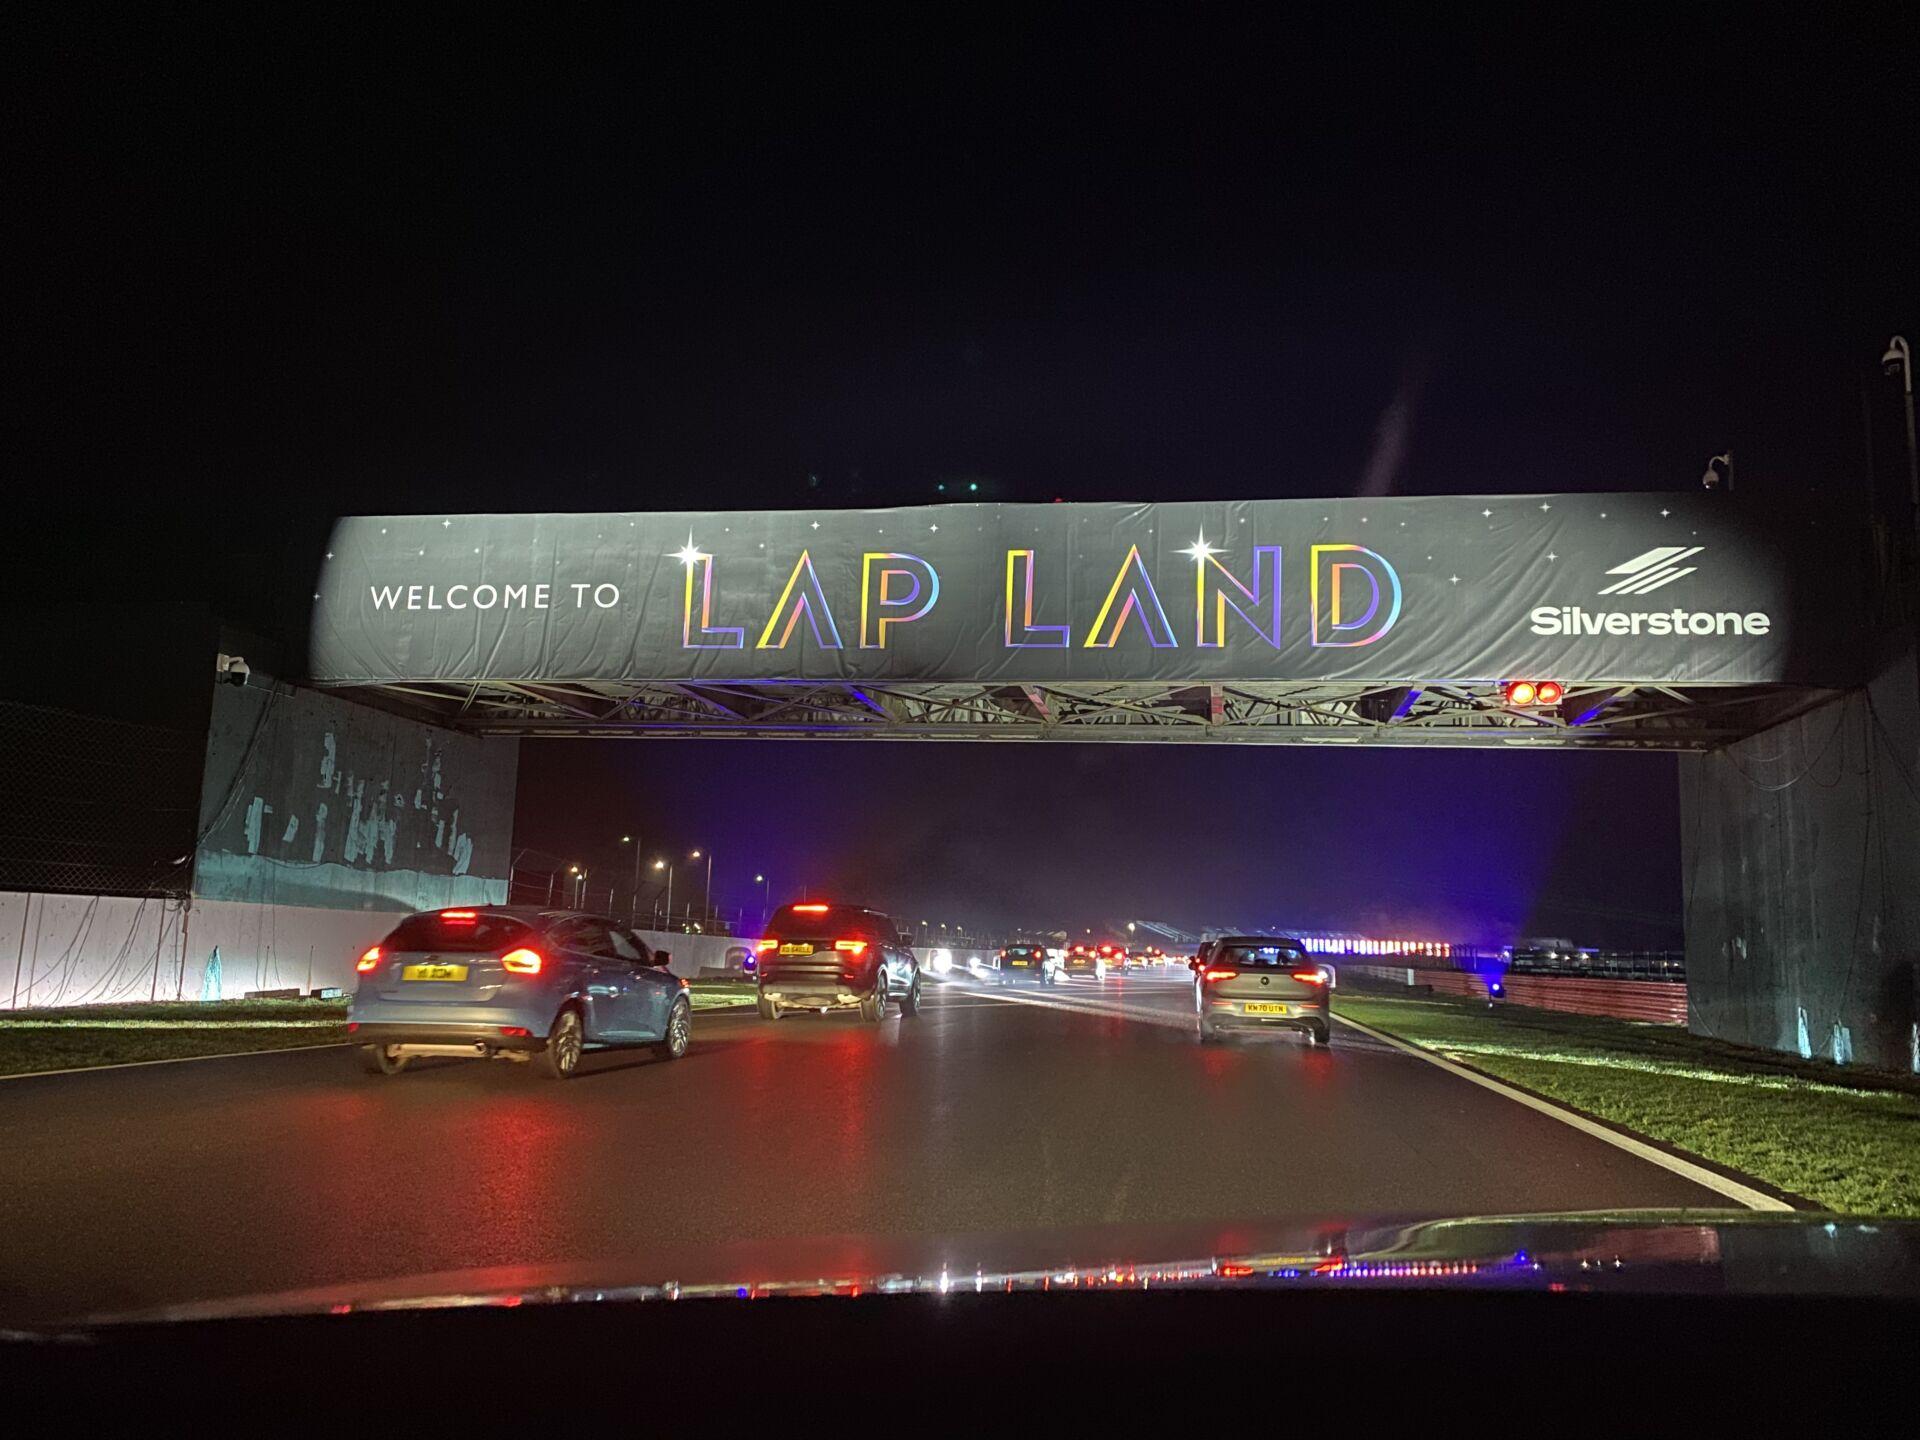 Lapland Silverstone Sign